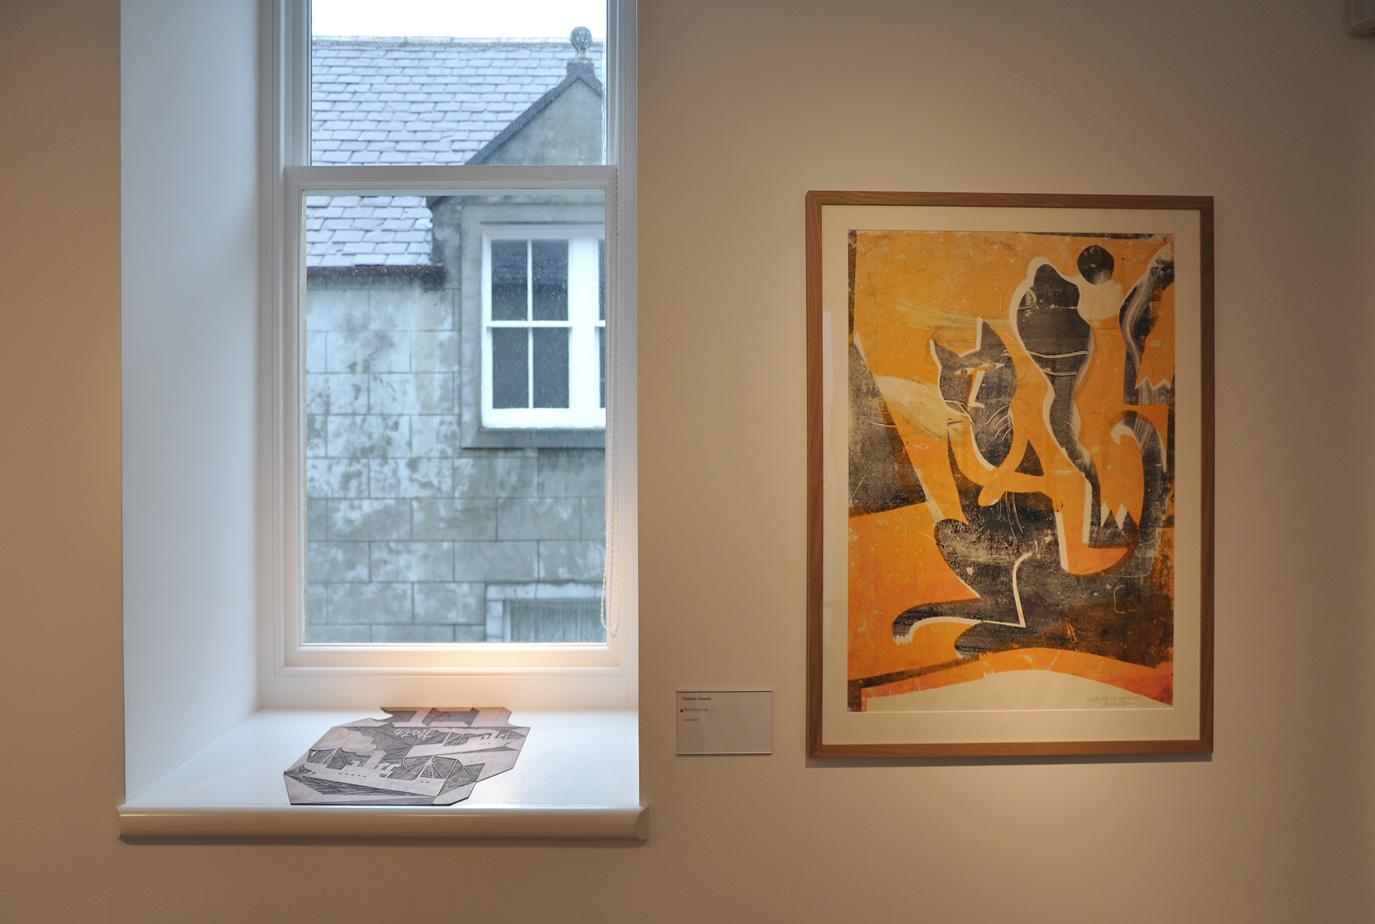 shearer-gallery-three-window-3.jpg